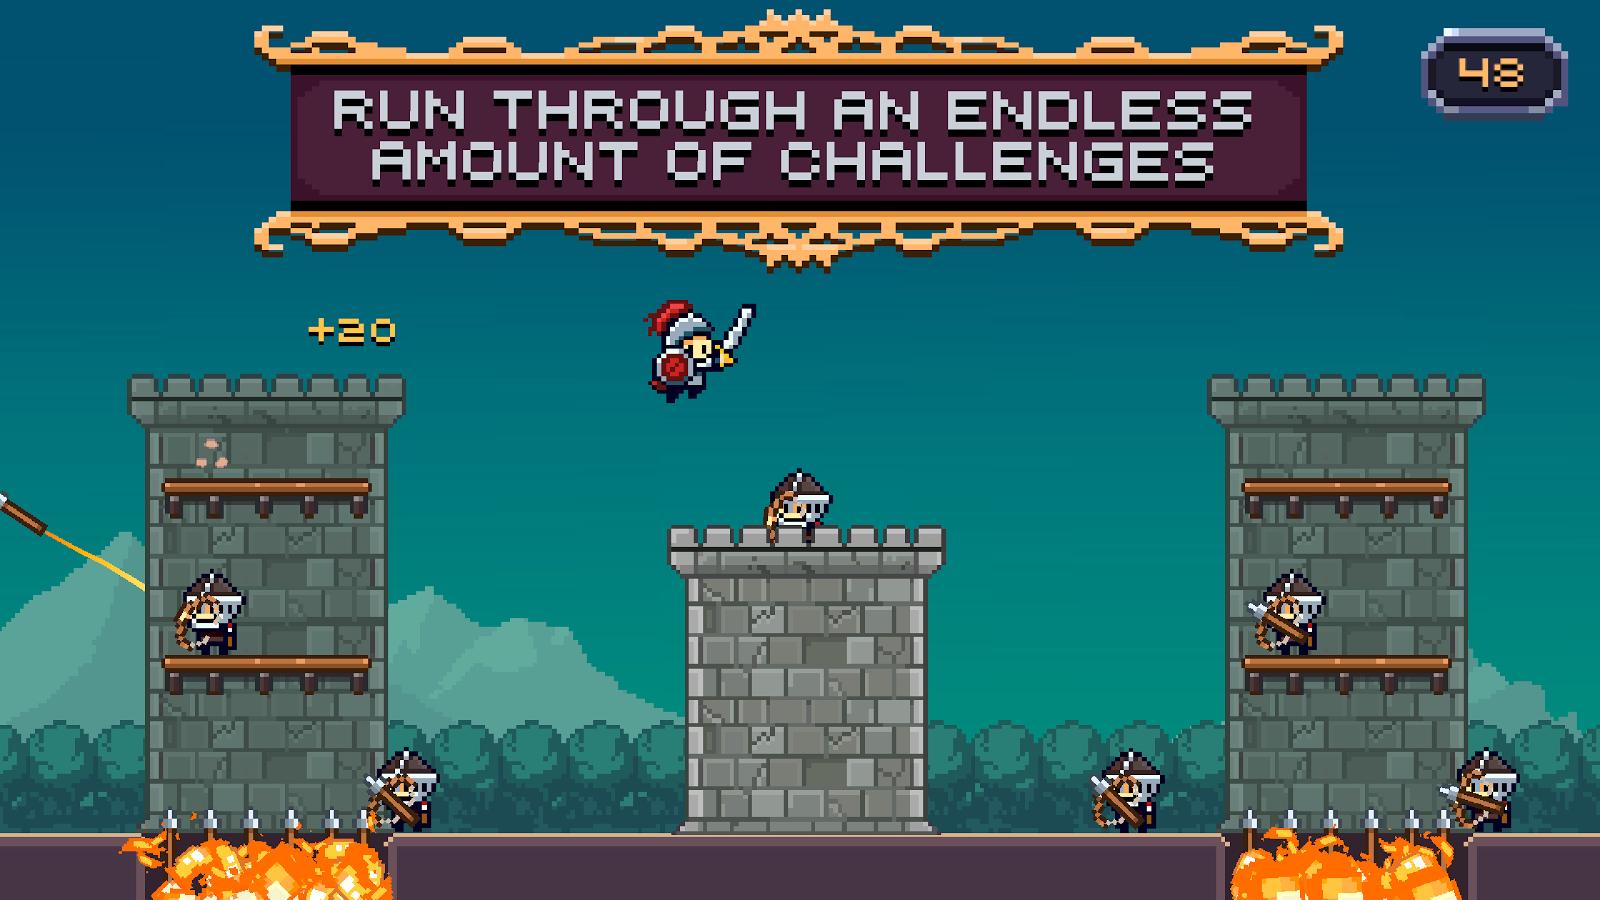 Fun addicting game apps - Dashy Knight